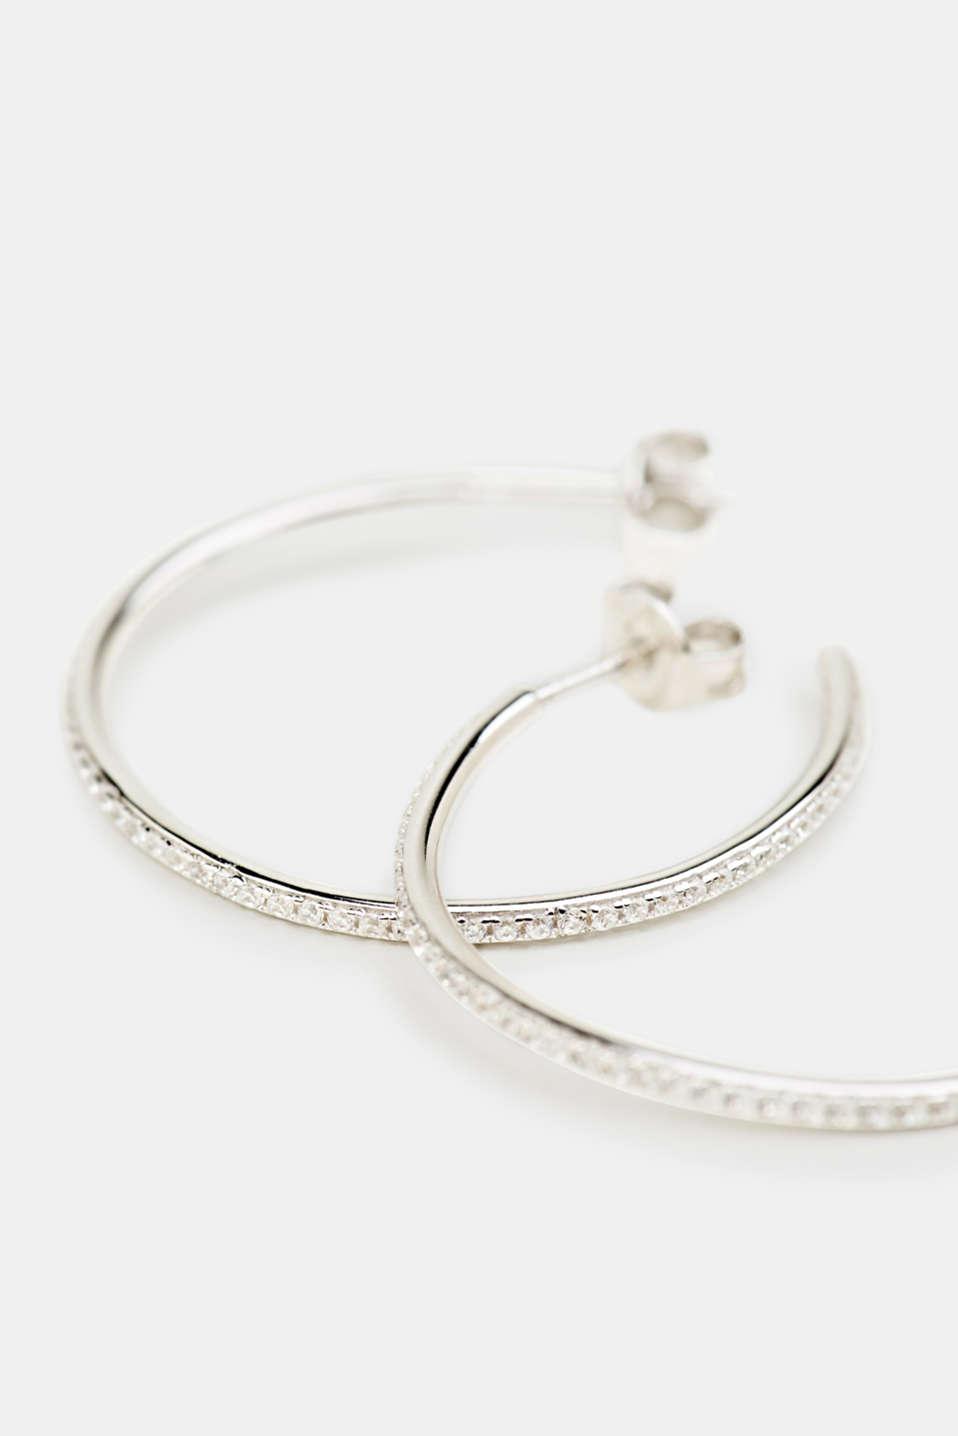 Hoop earrings with zirconia, sterling silver, LCSILVER, detail image number 1